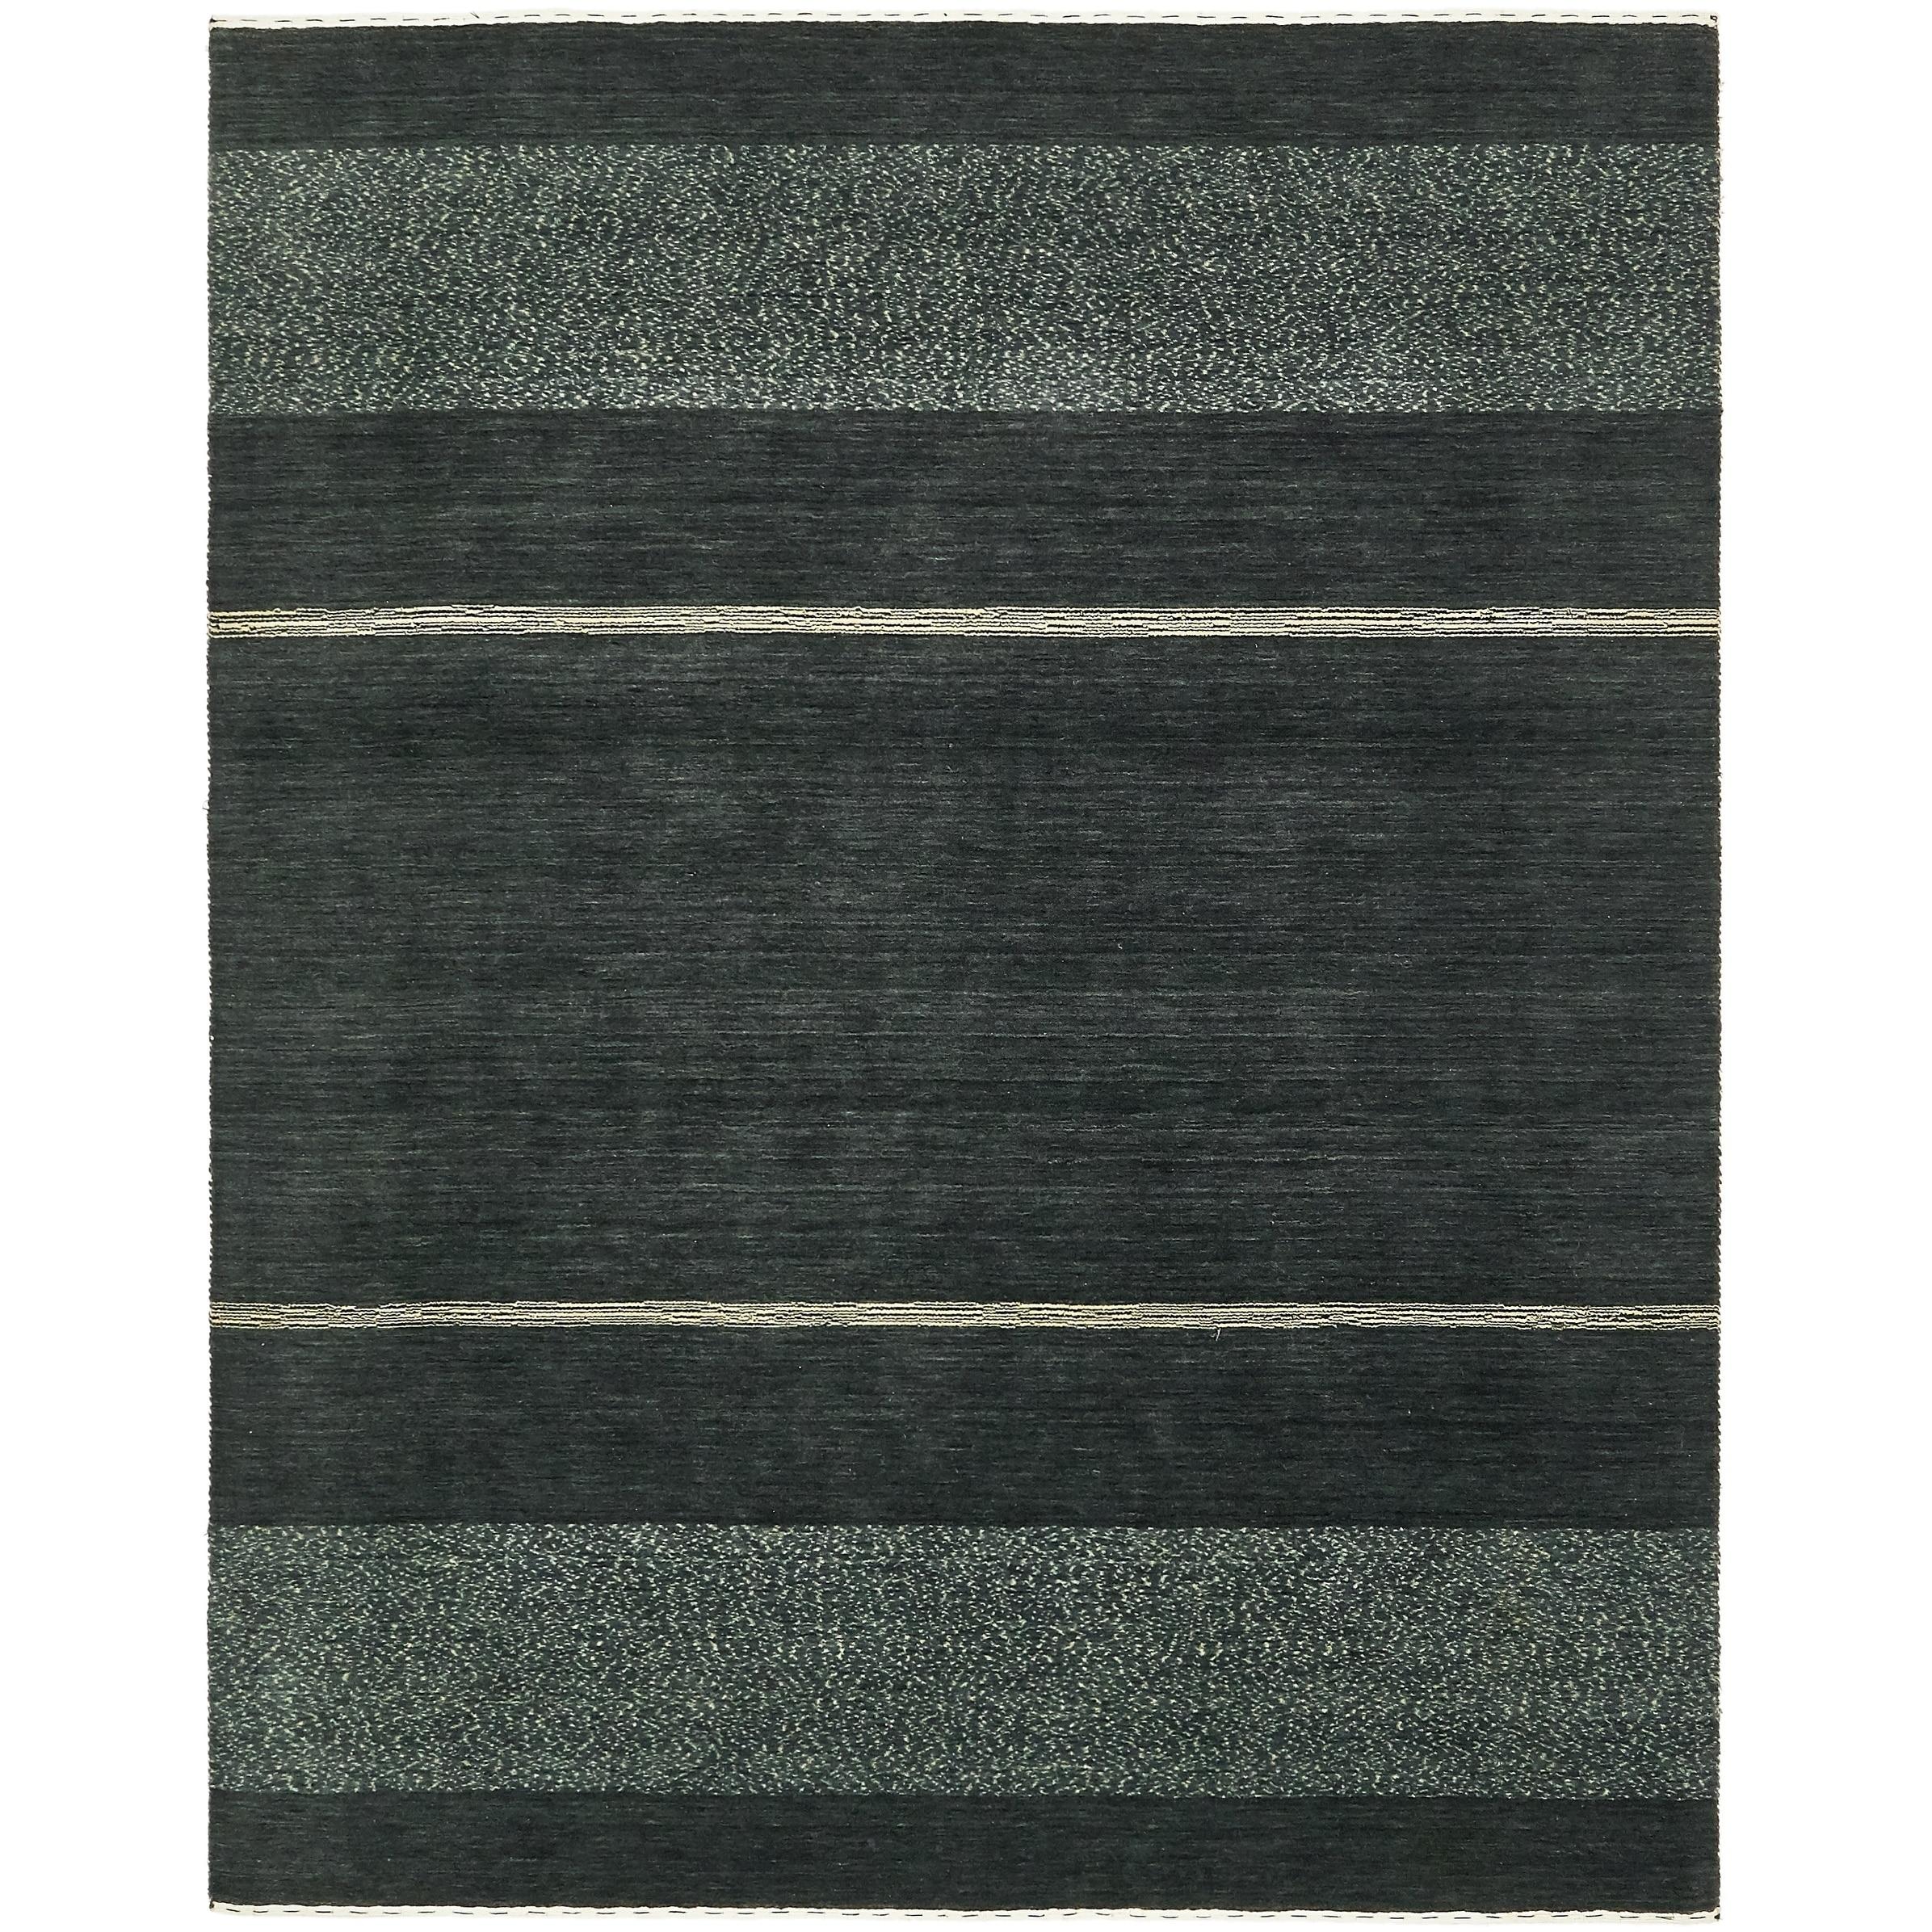 Hand Knotted Kashkuli Gabbeh Wool Area Rug - 6 8 x 8 4 (Dark Gray - 6 8 x 8 4)